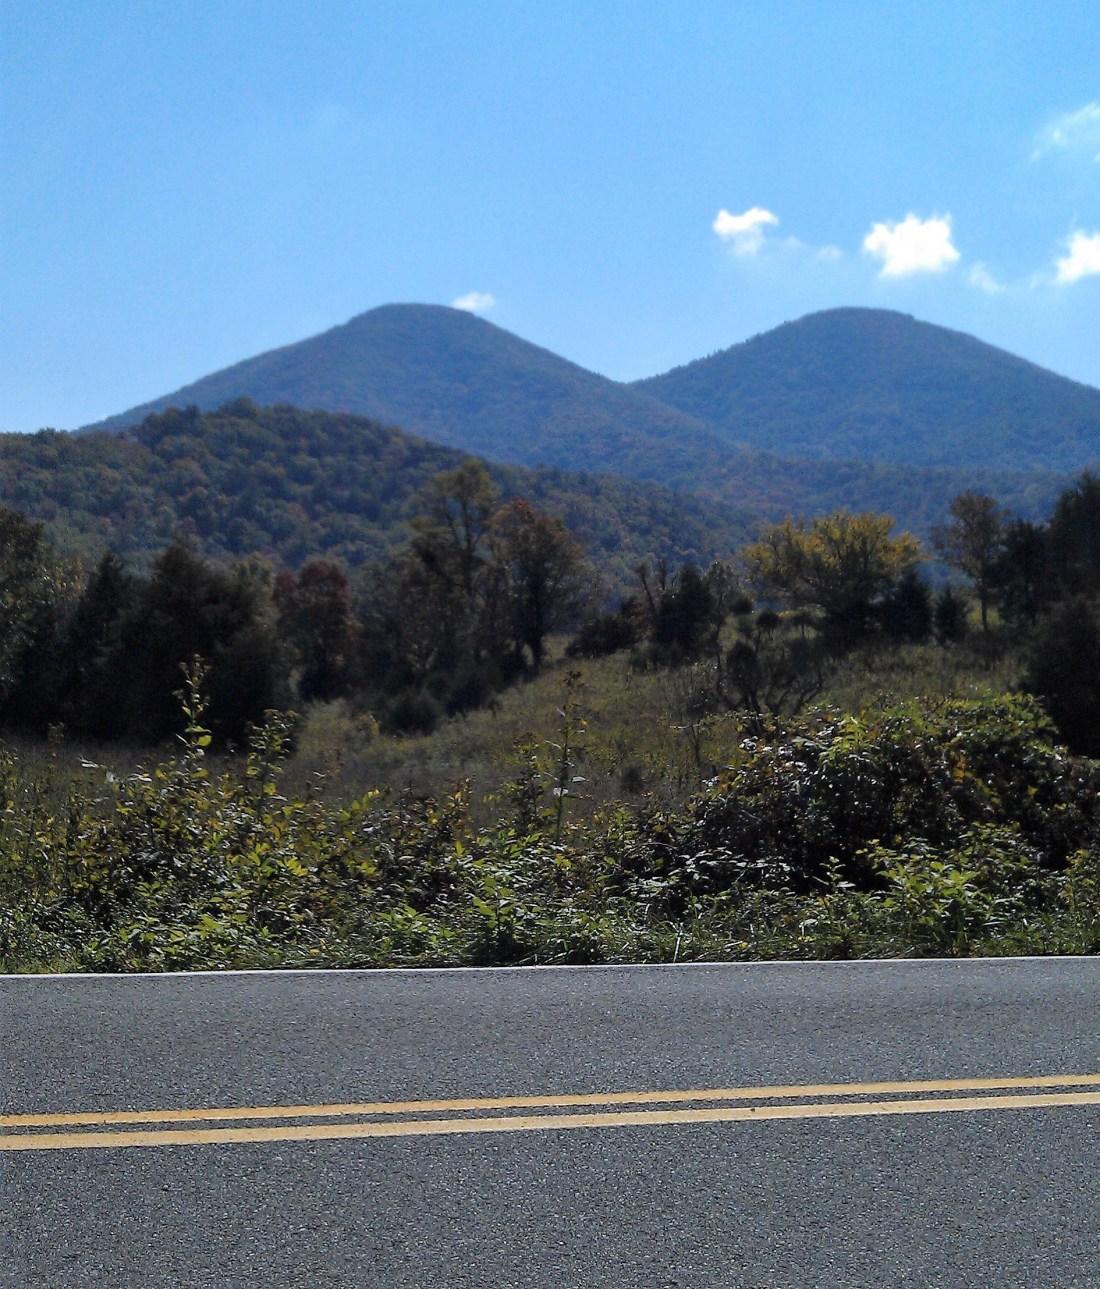 mountainroad-e1525398435111.jpg